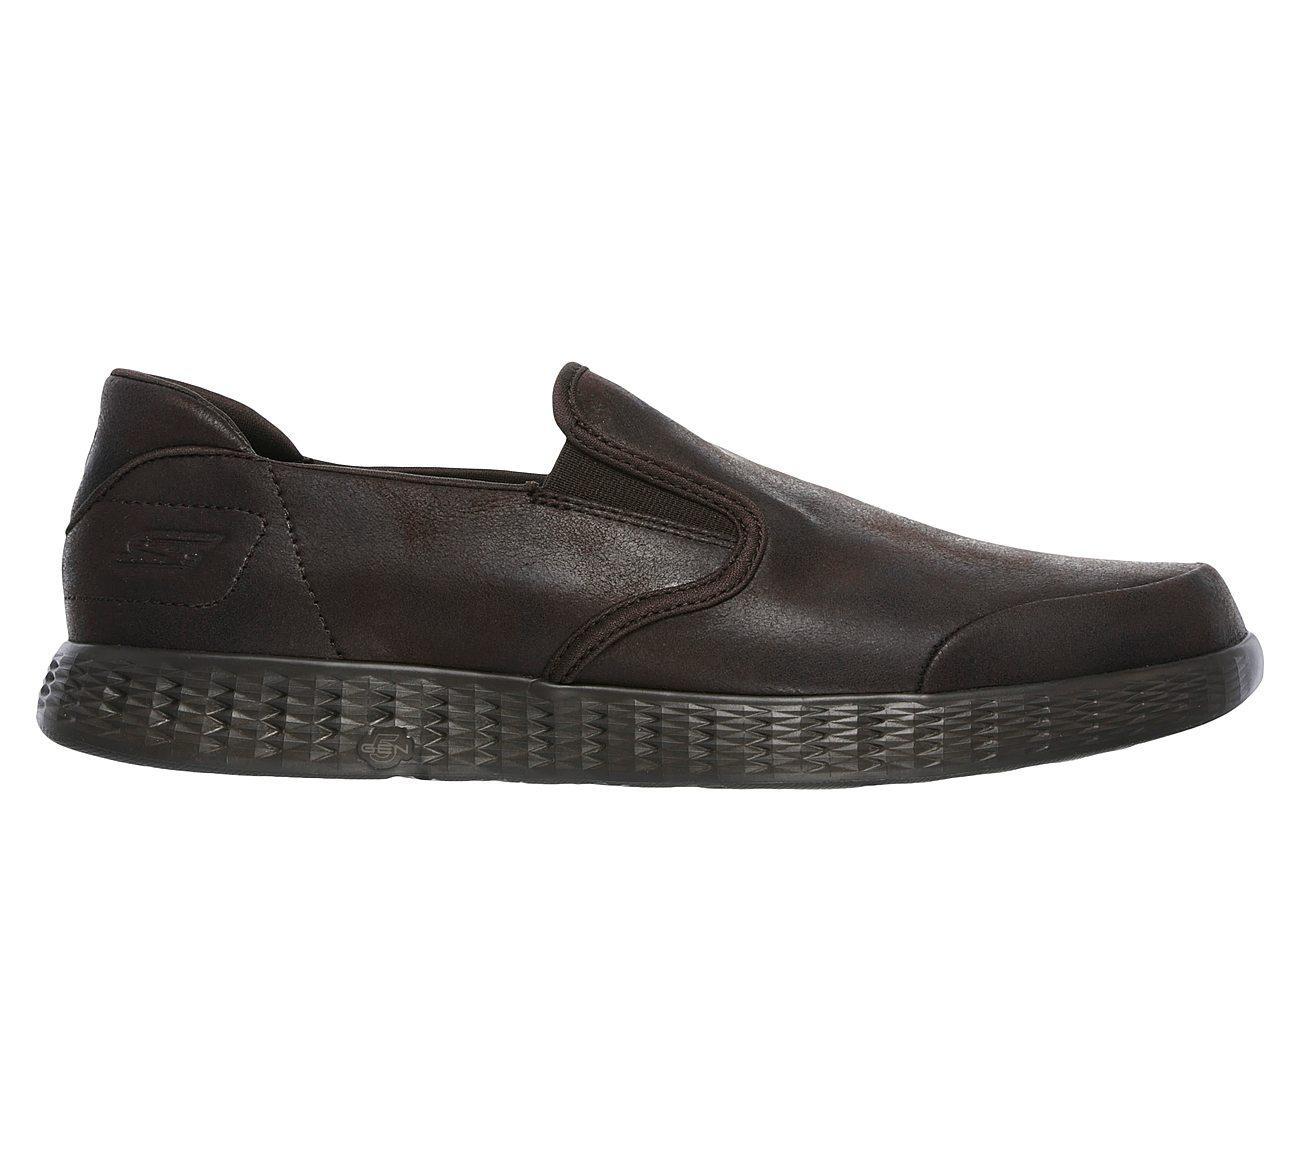 buy skechers skechers on the go glide surpass skechers performance shoes only. Black Bedroom Furniture Sets. Home Design Ideas